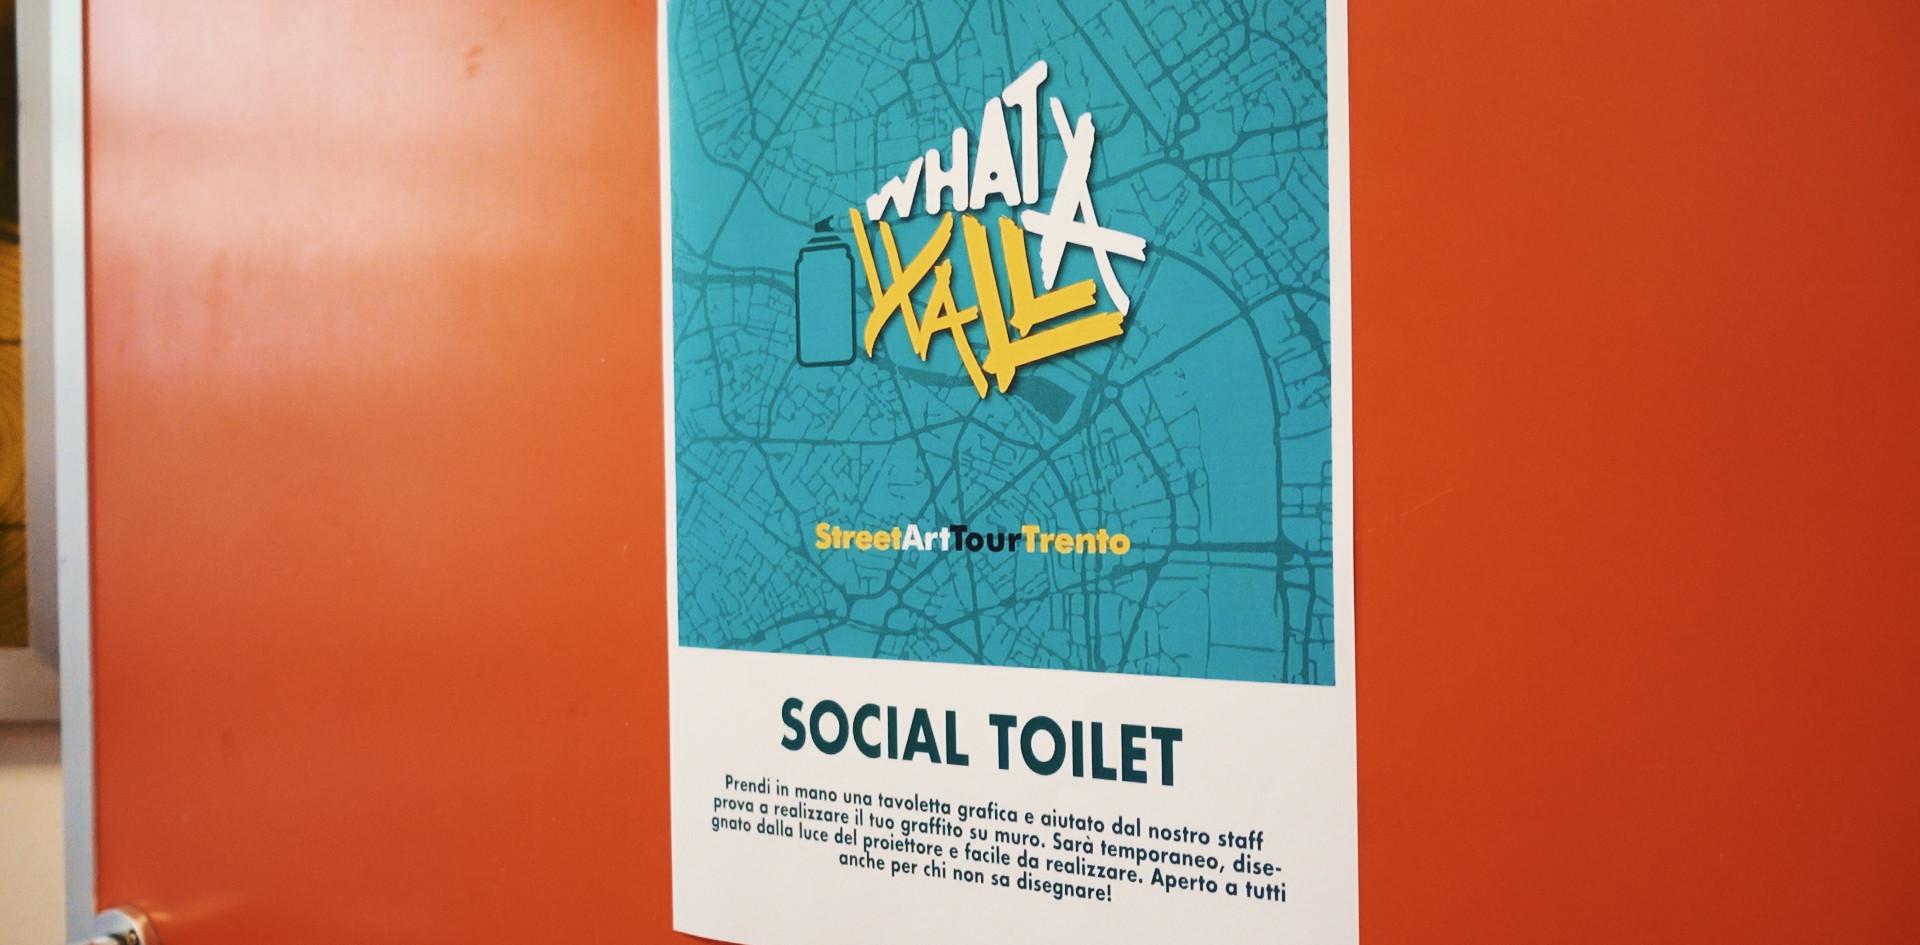 What a Wall - Sopralluogo creativo, Soci